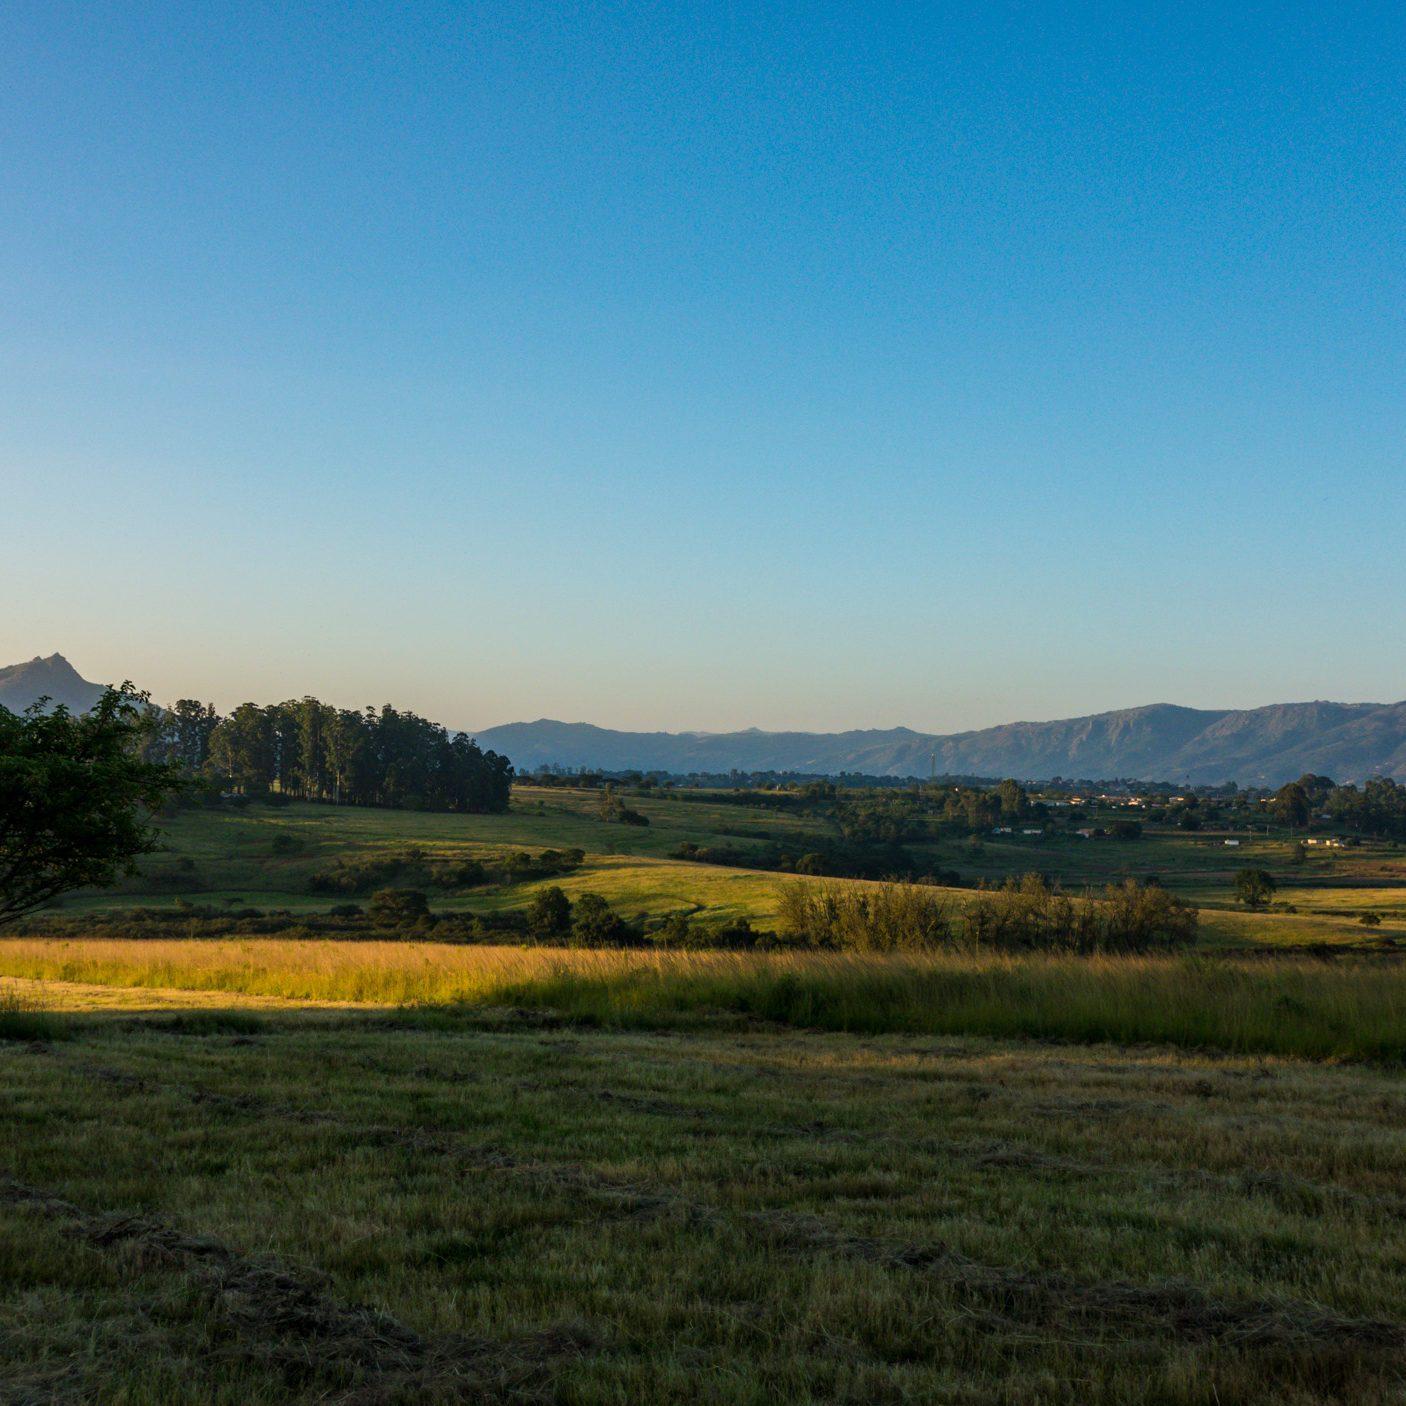 Swaziland_33662707715-circle